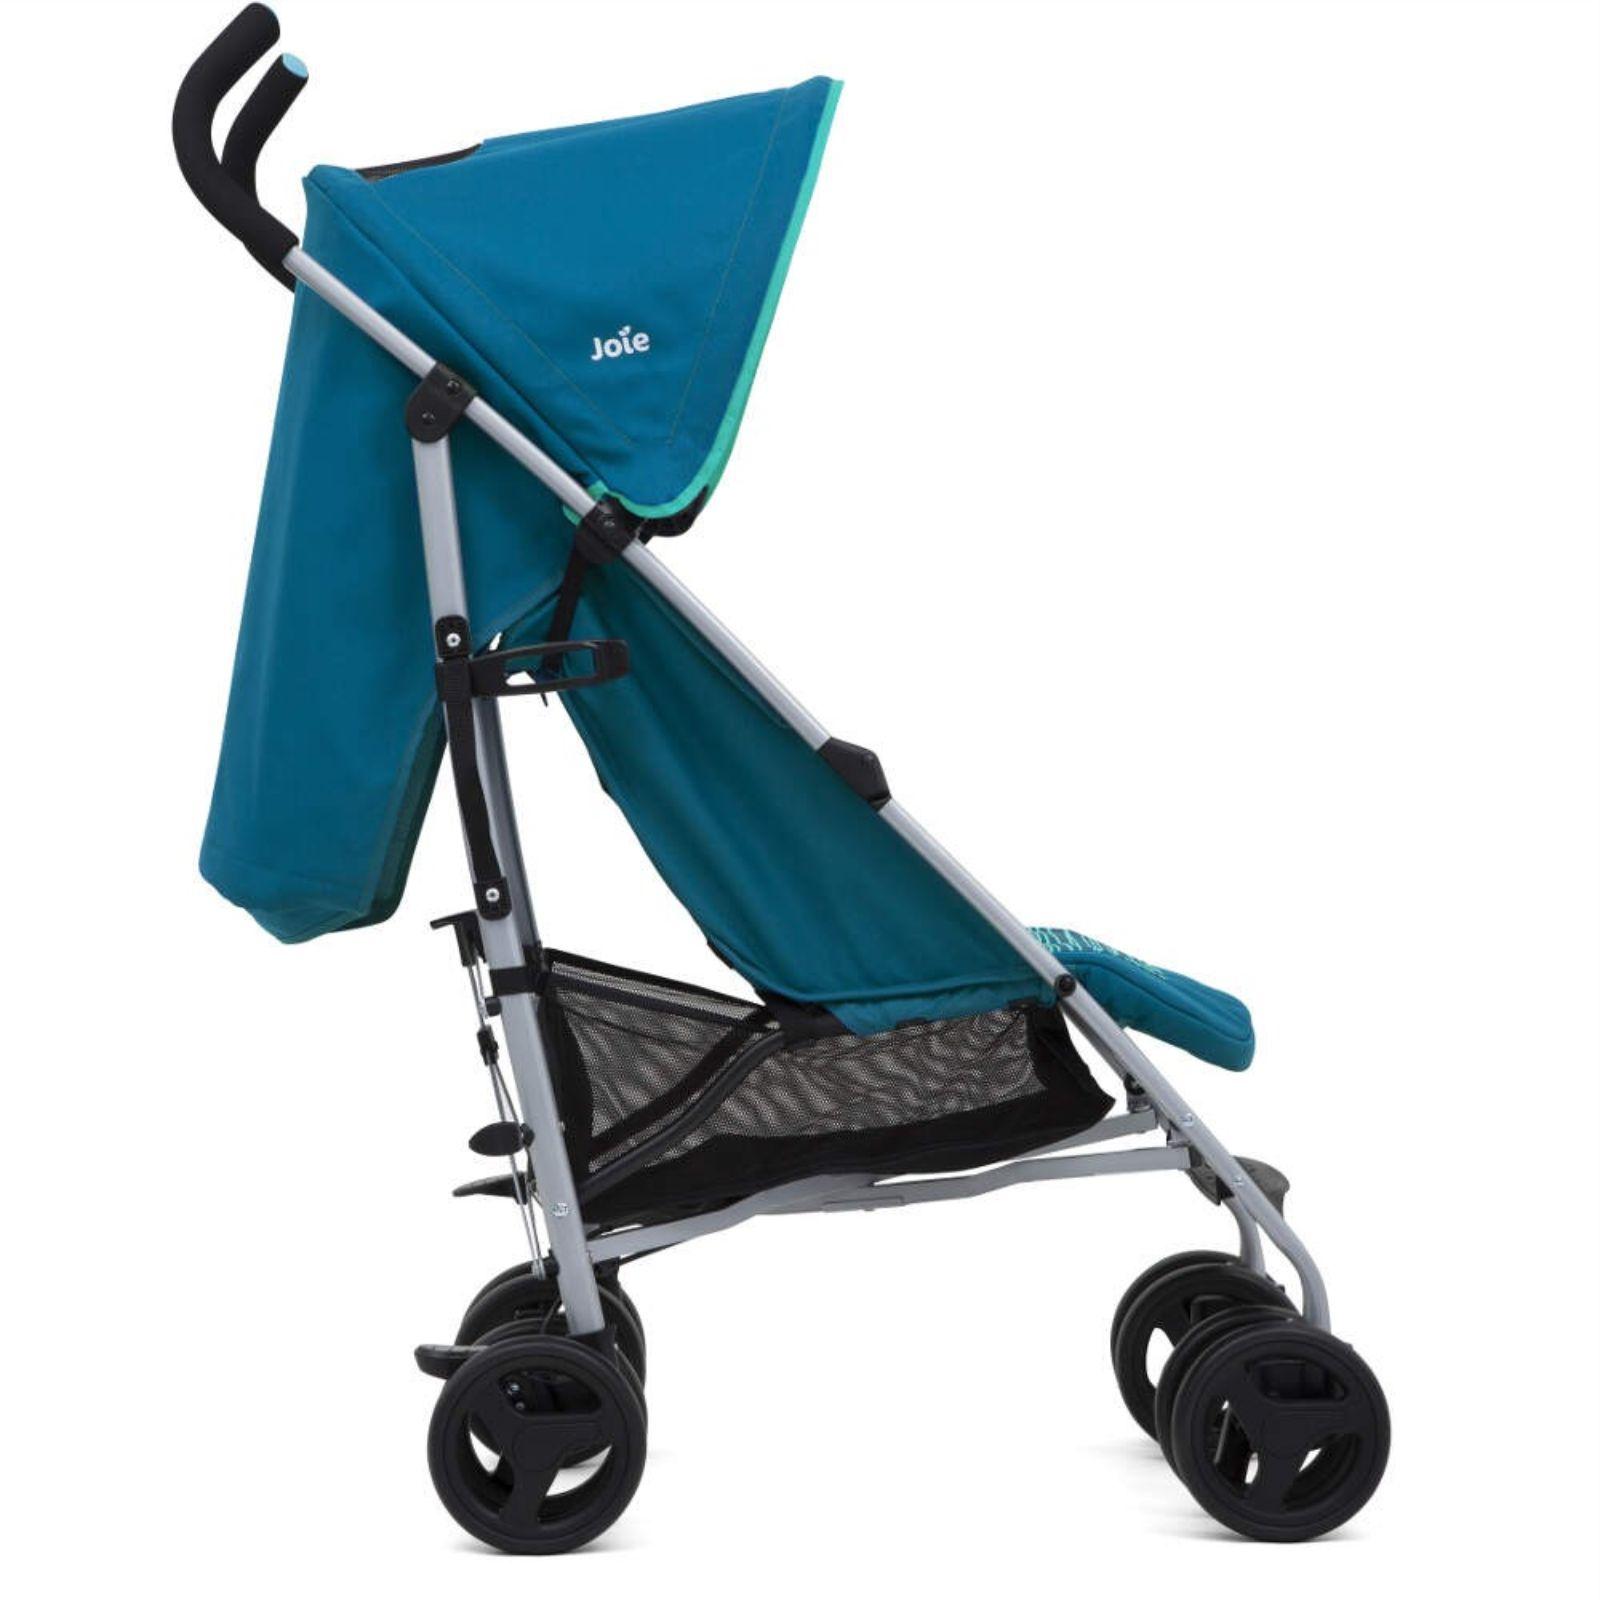 joie nitro pushchair stroller skewed lines blue buy at online4baby. Black Bedroom Furniture Sets. Home Design Ideas